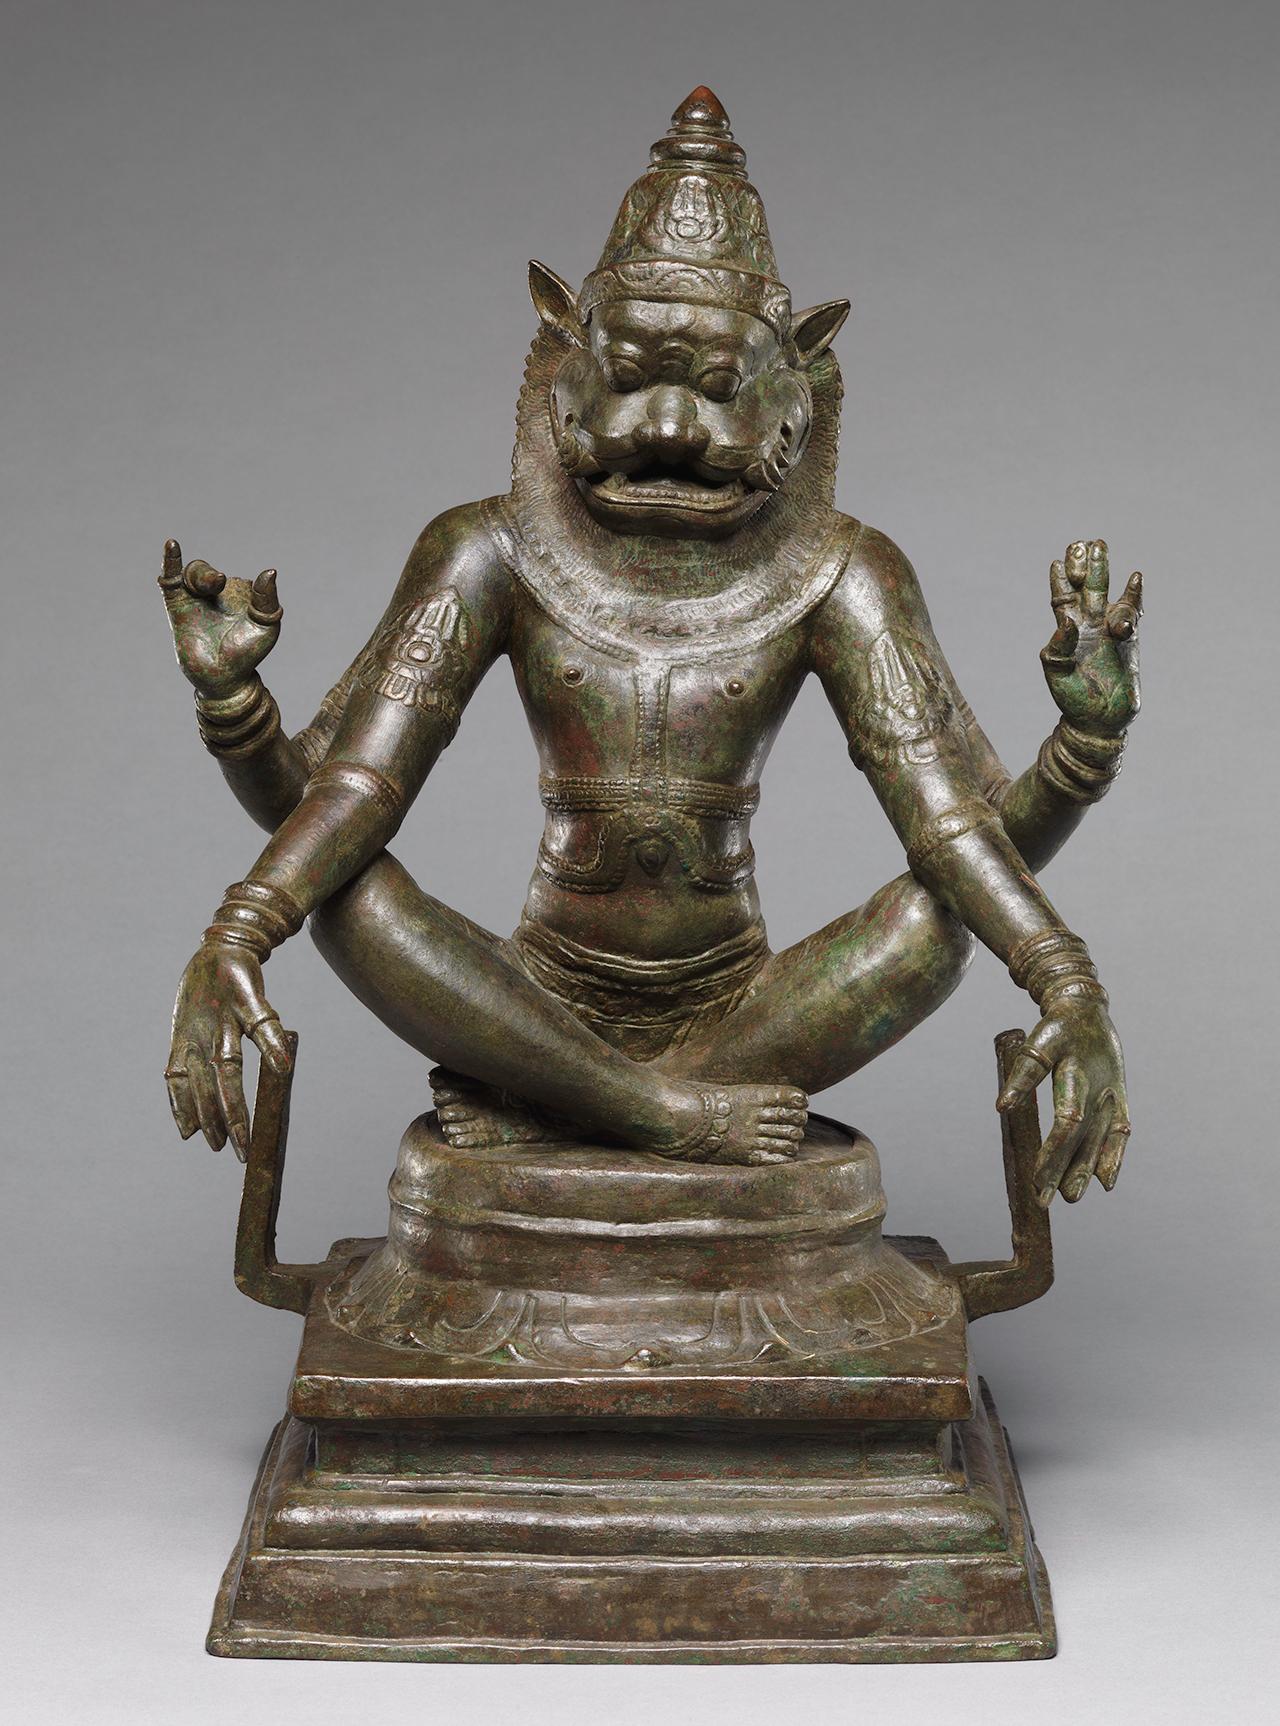 Yoga Narasimha, Vishnu's Man-Lion Incarnation (12th century), India (Tamil Nadu), Chola period (880–1279), copper alloy, h: 18 3/4 in (47.6 cm); w: 13 in (33 cm); d: 9 1/2 in (24.1 cm), The Metropolitan Museum of Art, New York, Samuel Eilenberg Collection, Bequest of Samuel Eilenberg, 1998 (photo courtesy The Metropolitan Museum of Art)